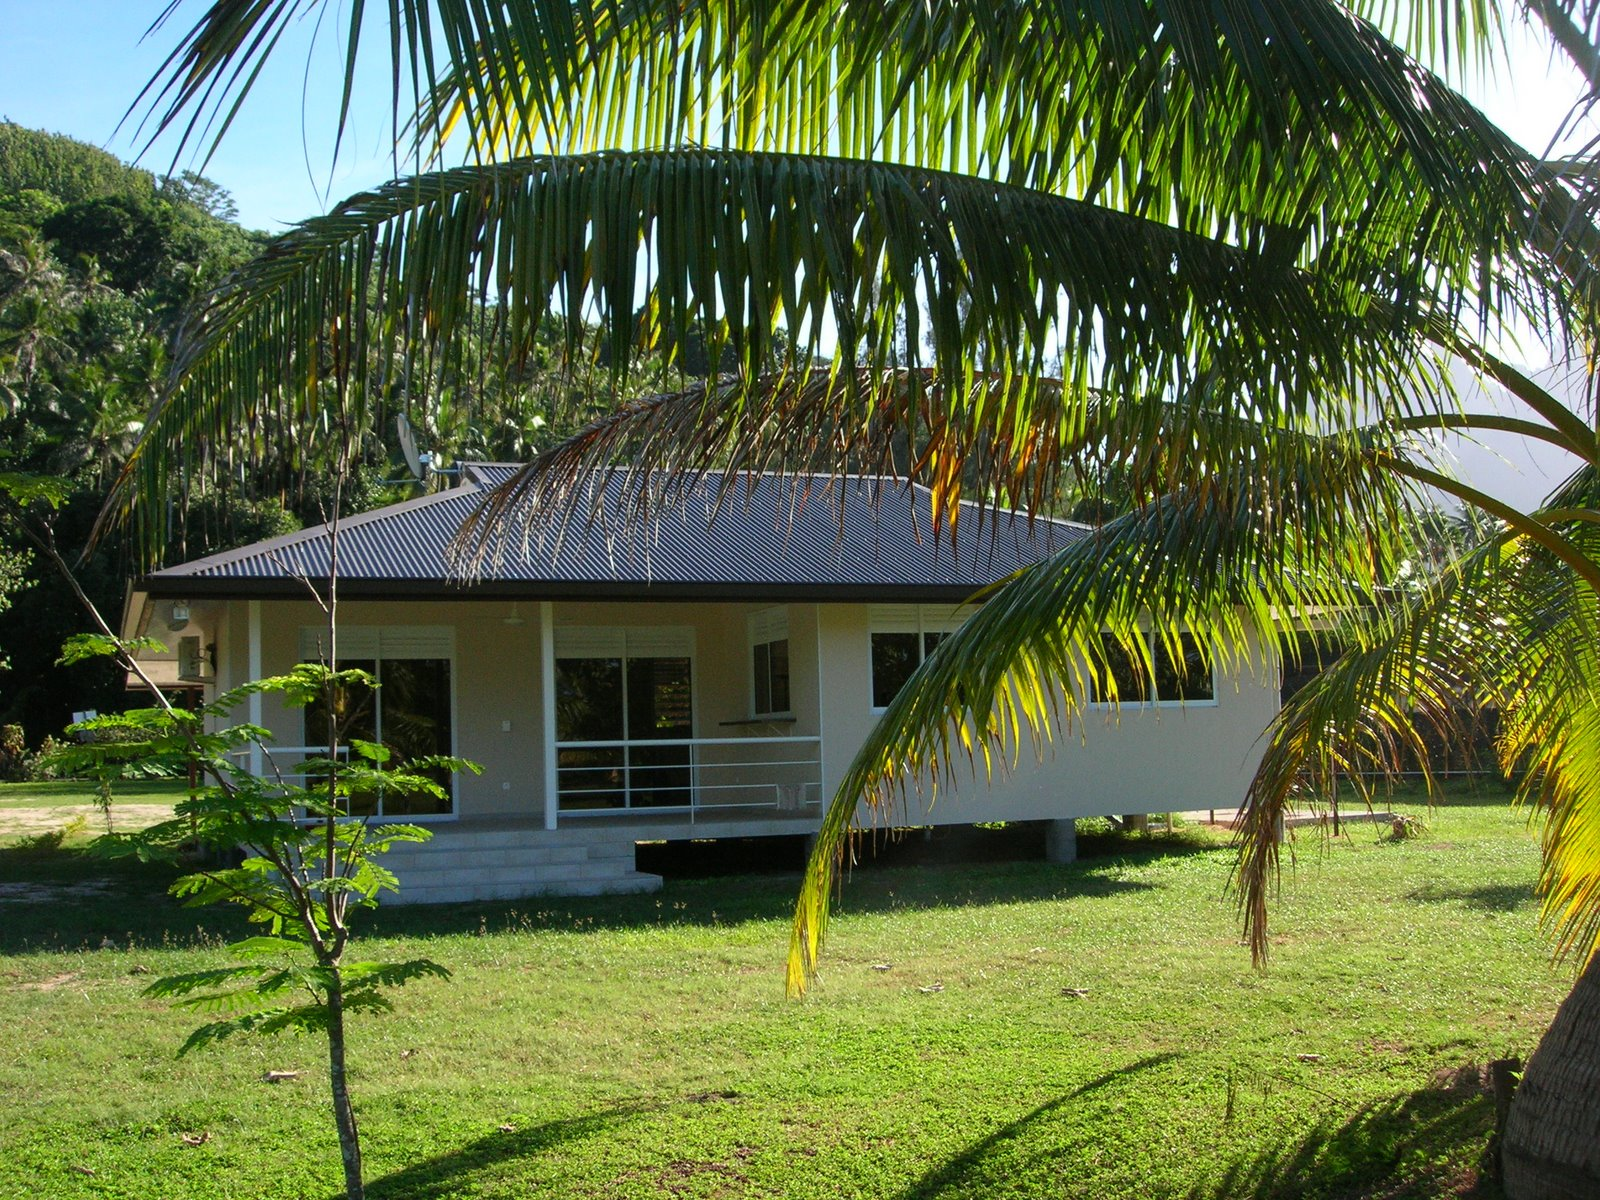 moorea tahiti maisons meublees direct proprietaire